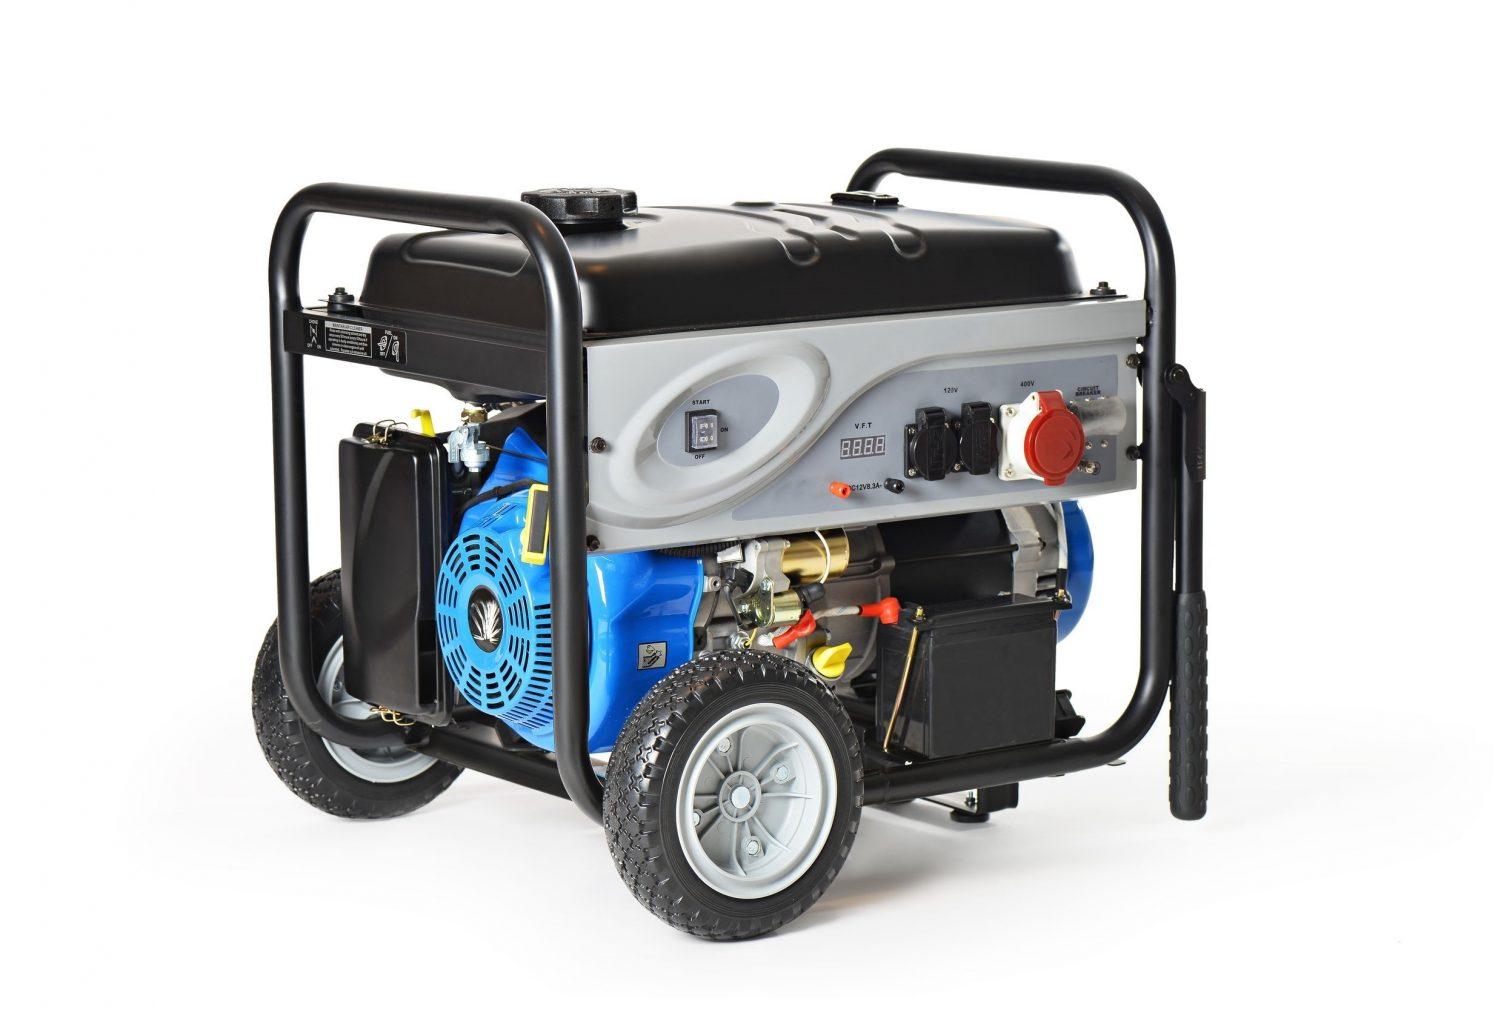 Portable generator image